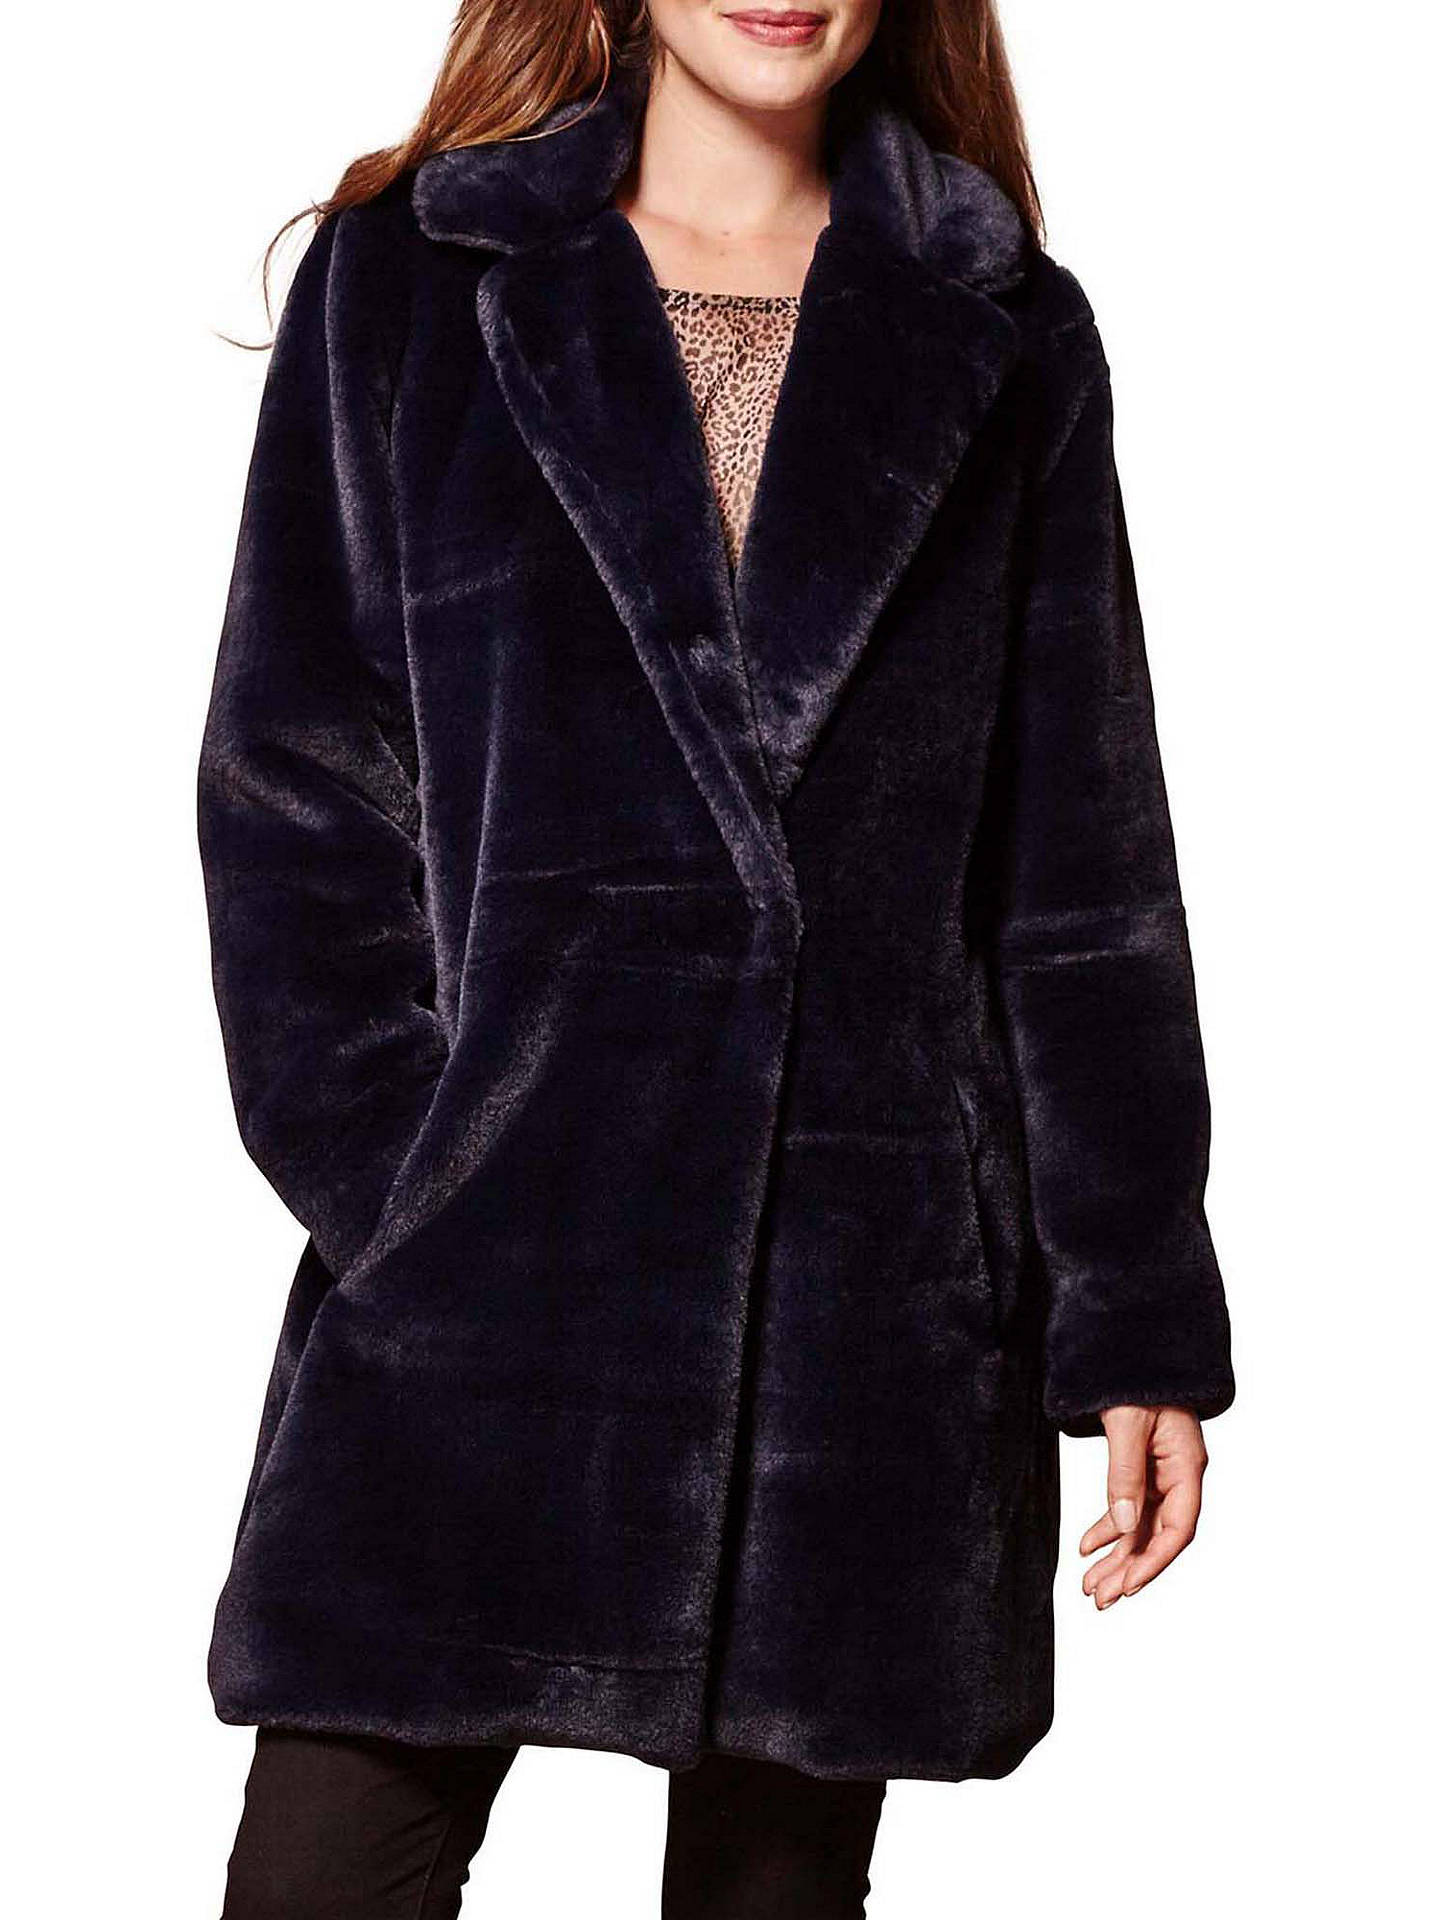 54c2846f1a63c Buy Yumi Oversized Faux Fur Coat